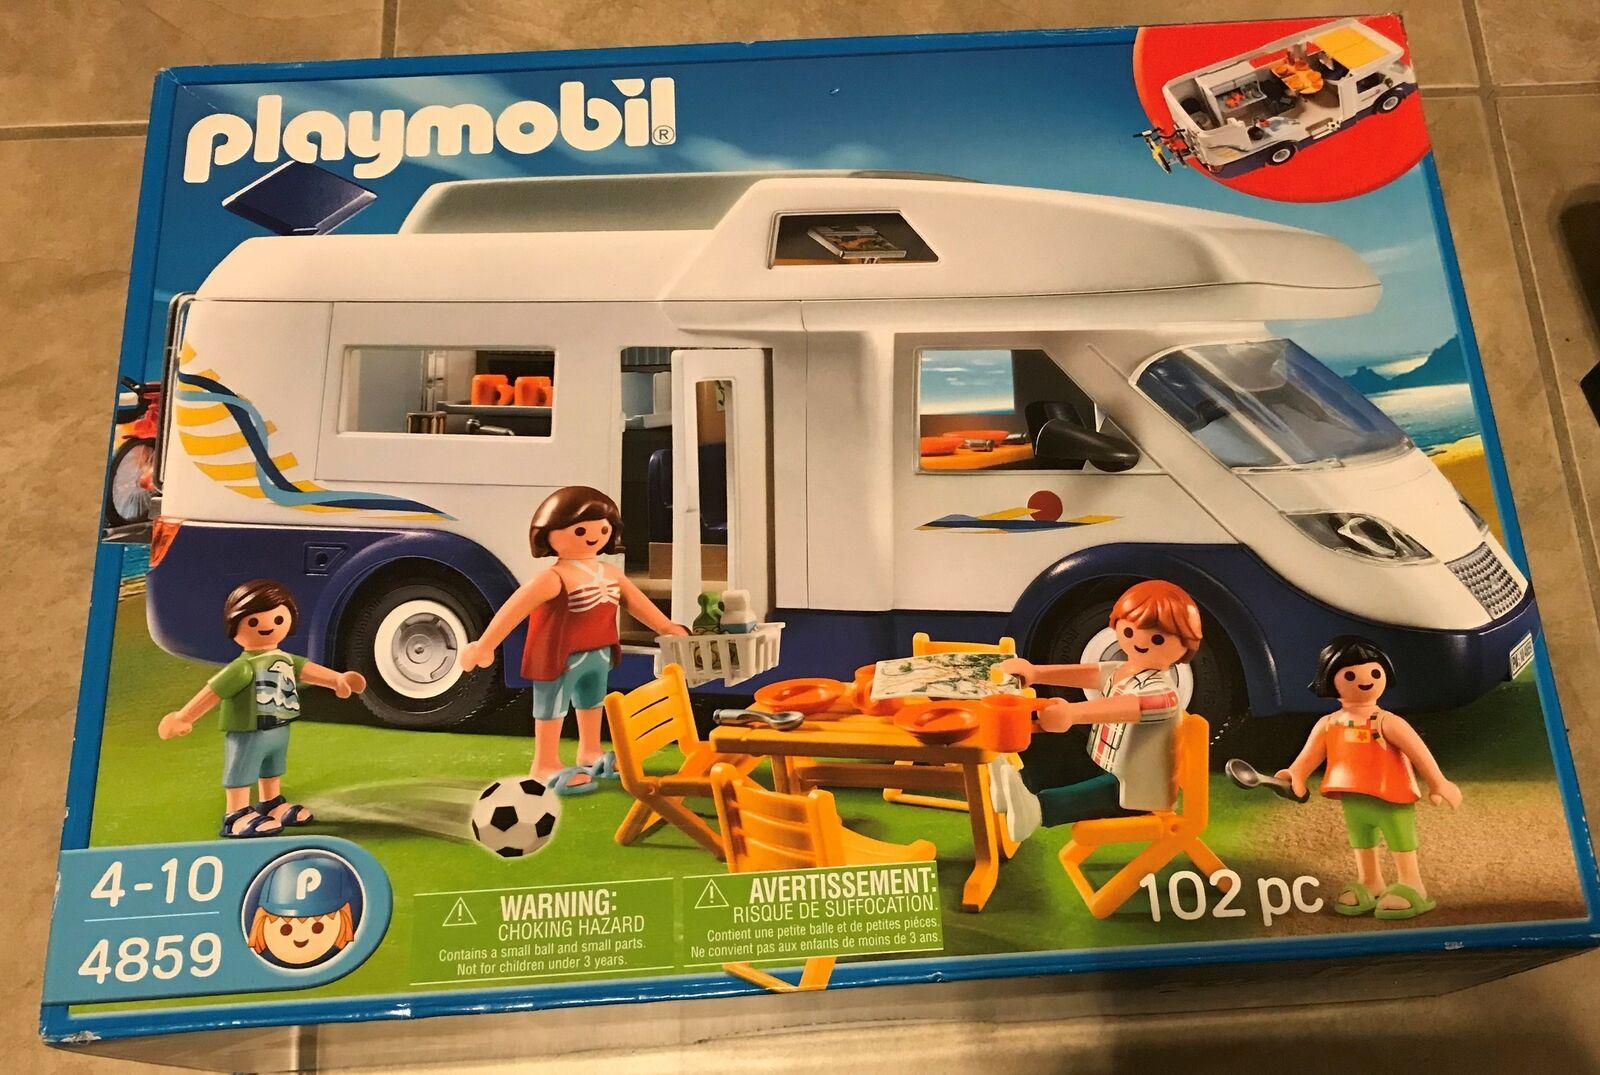 Playmobil Family Motor Home 4859  set nuovo factory sealed in original scatola  presa di marca